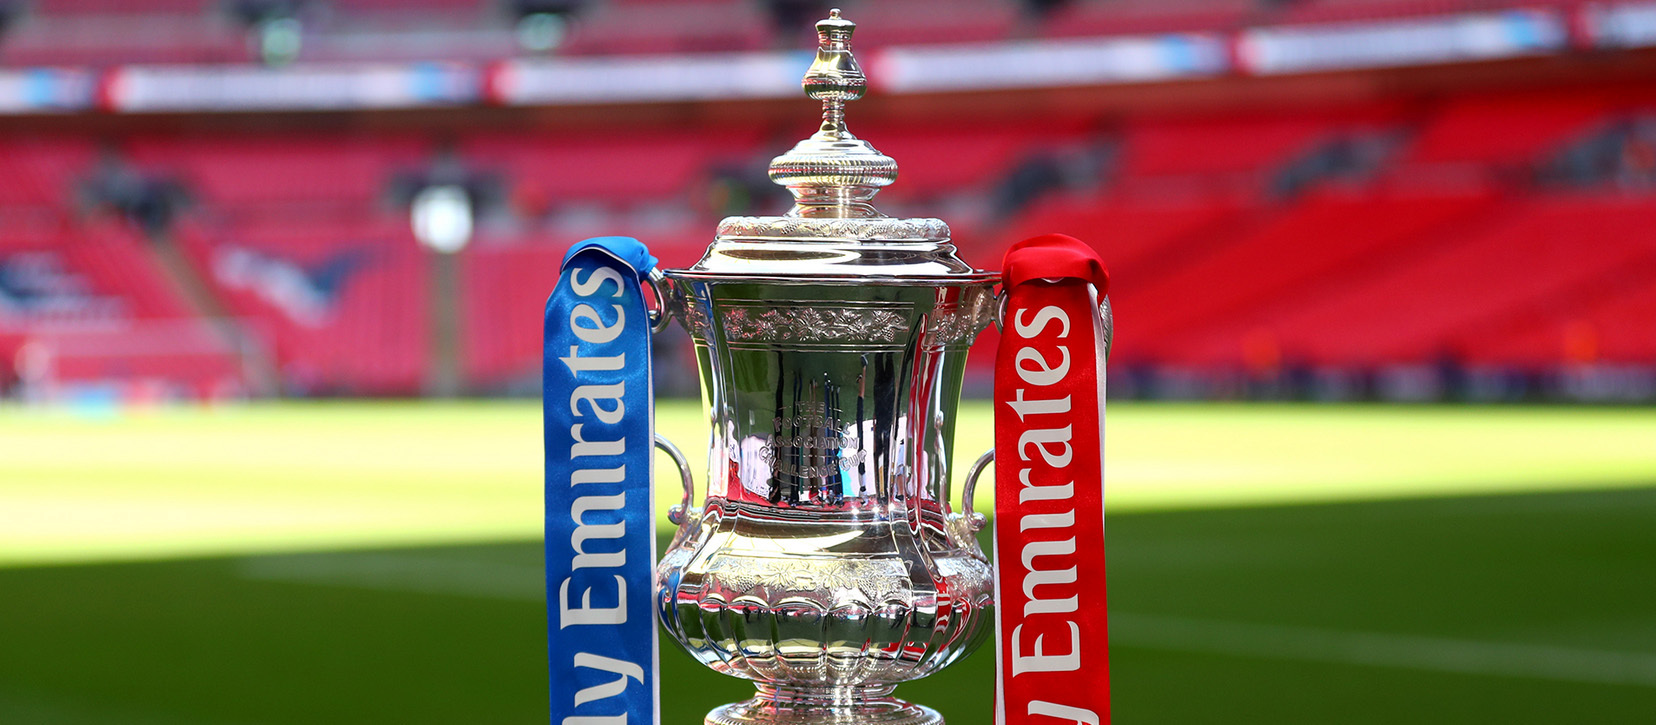 Chelsea - Leicester, ponturi pariuri finala Cupei Angliei. Tuchel vs Rodgers